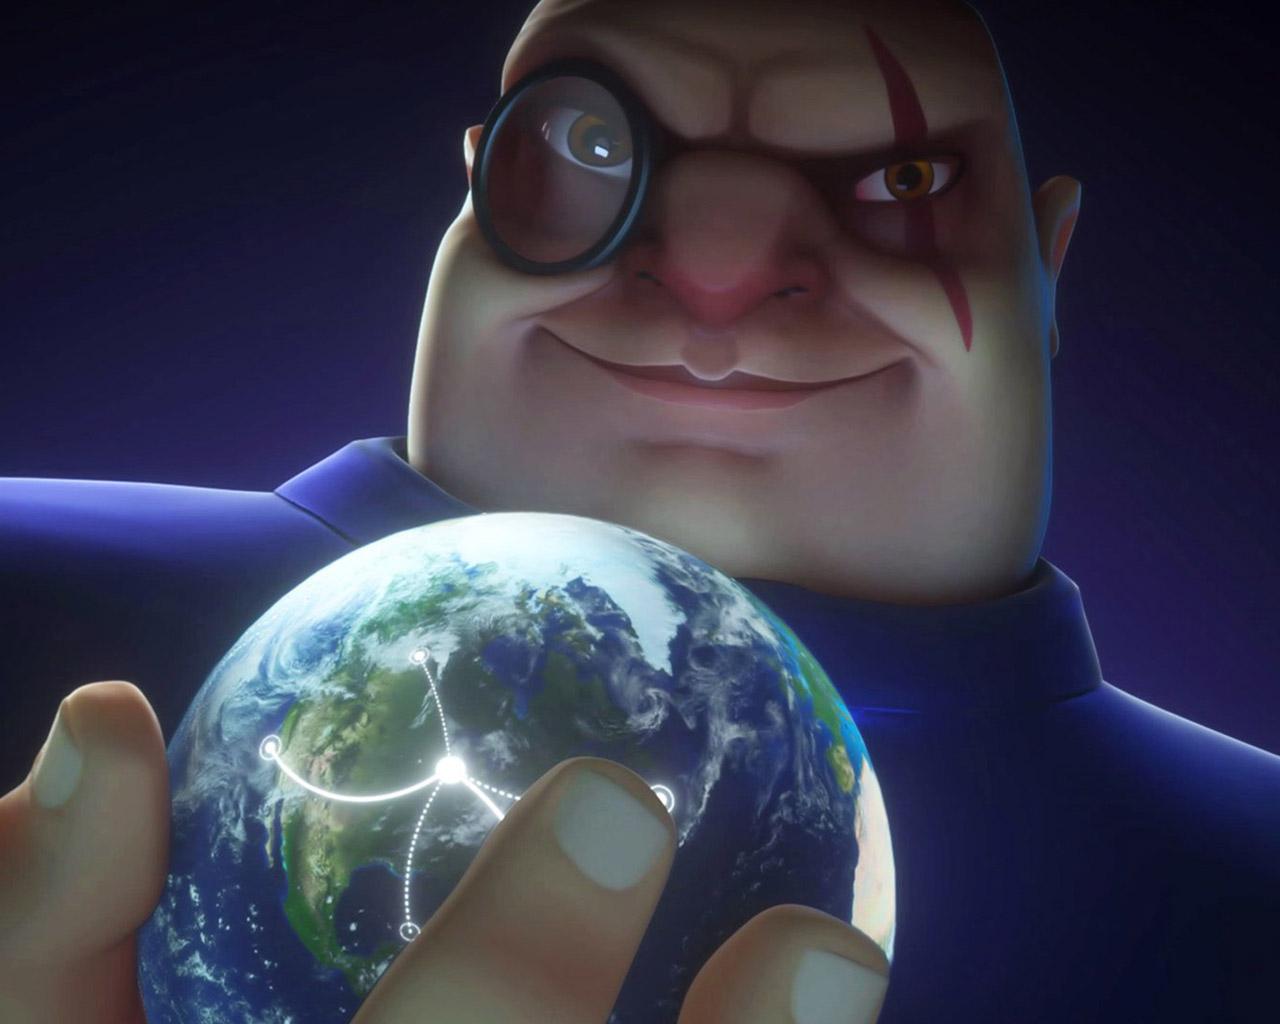 Free Evil Genius 2: World Domination Wallpaper in 1280x1024